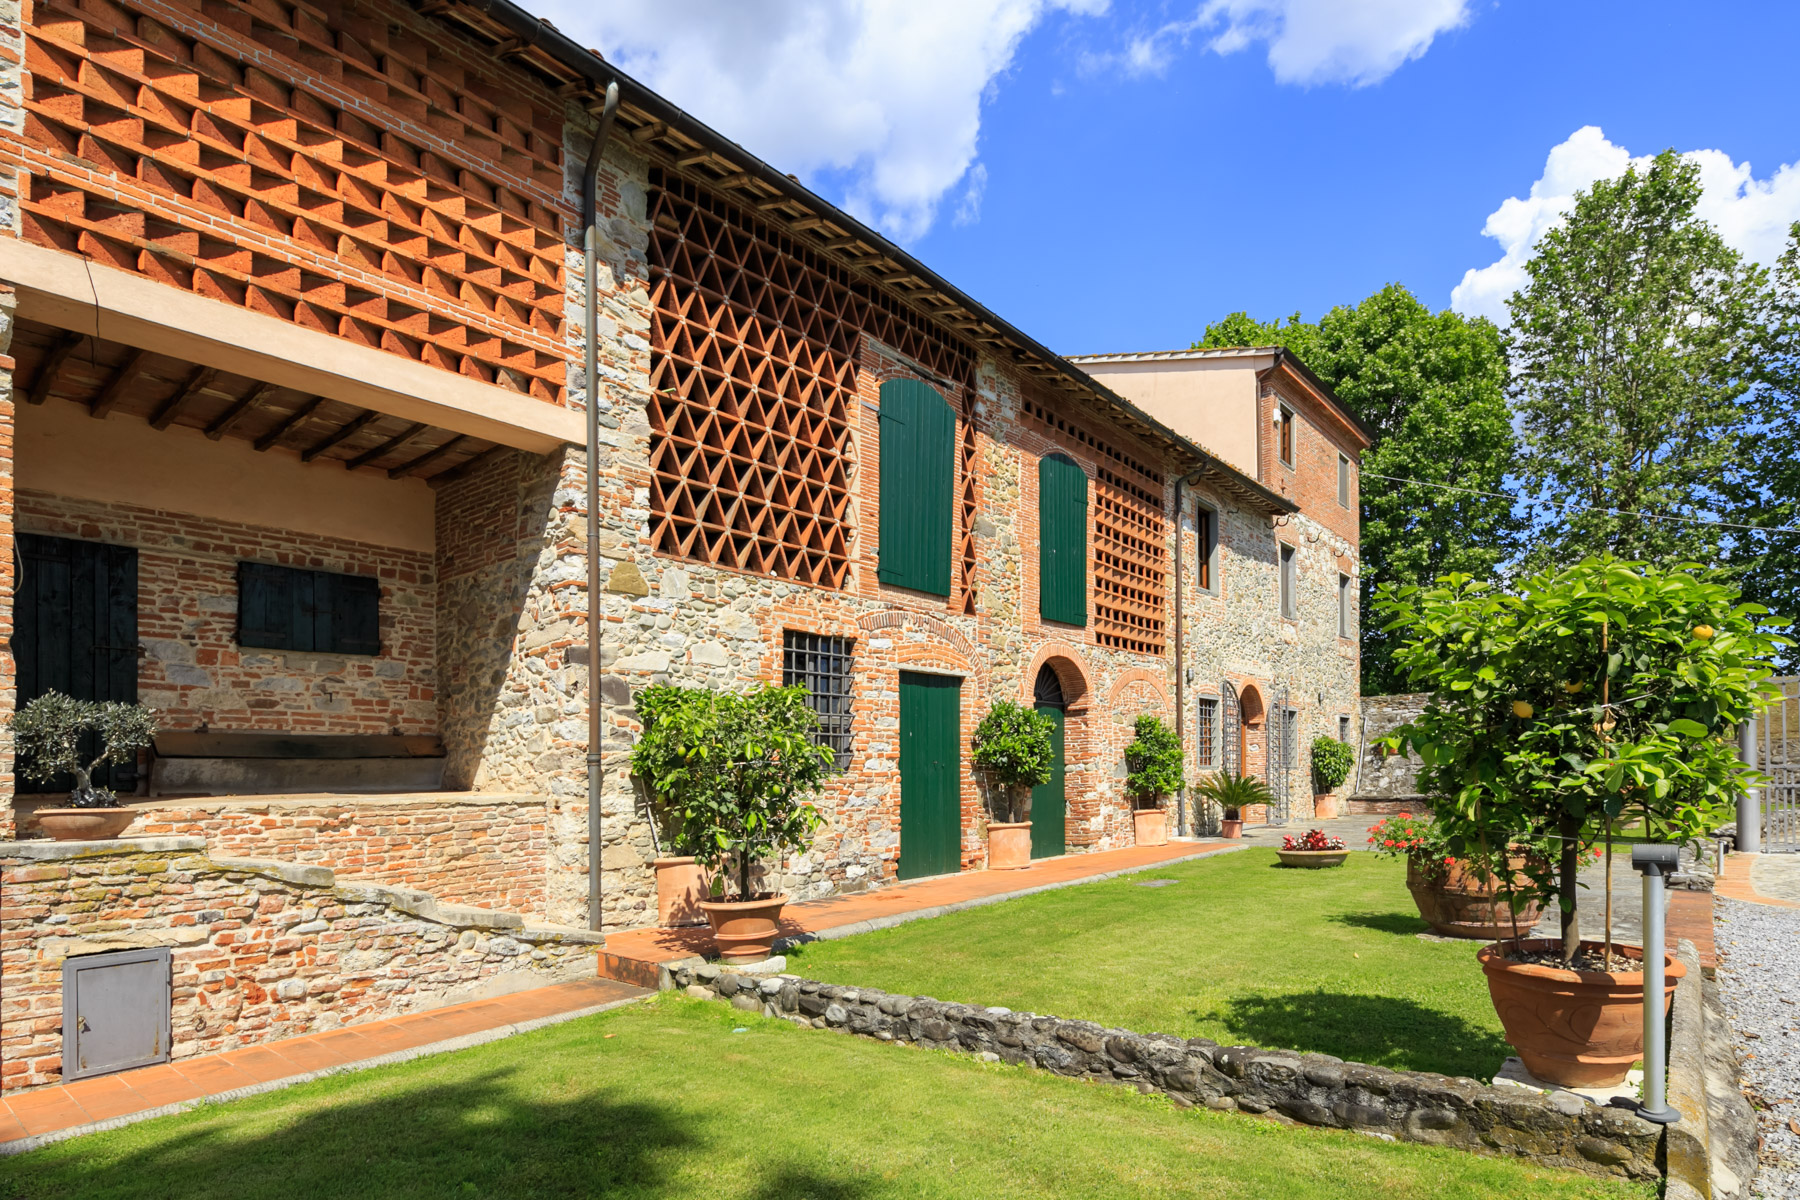 Rustico in Vendita a Lucca: 5 locali, 700 mq - Foto 3